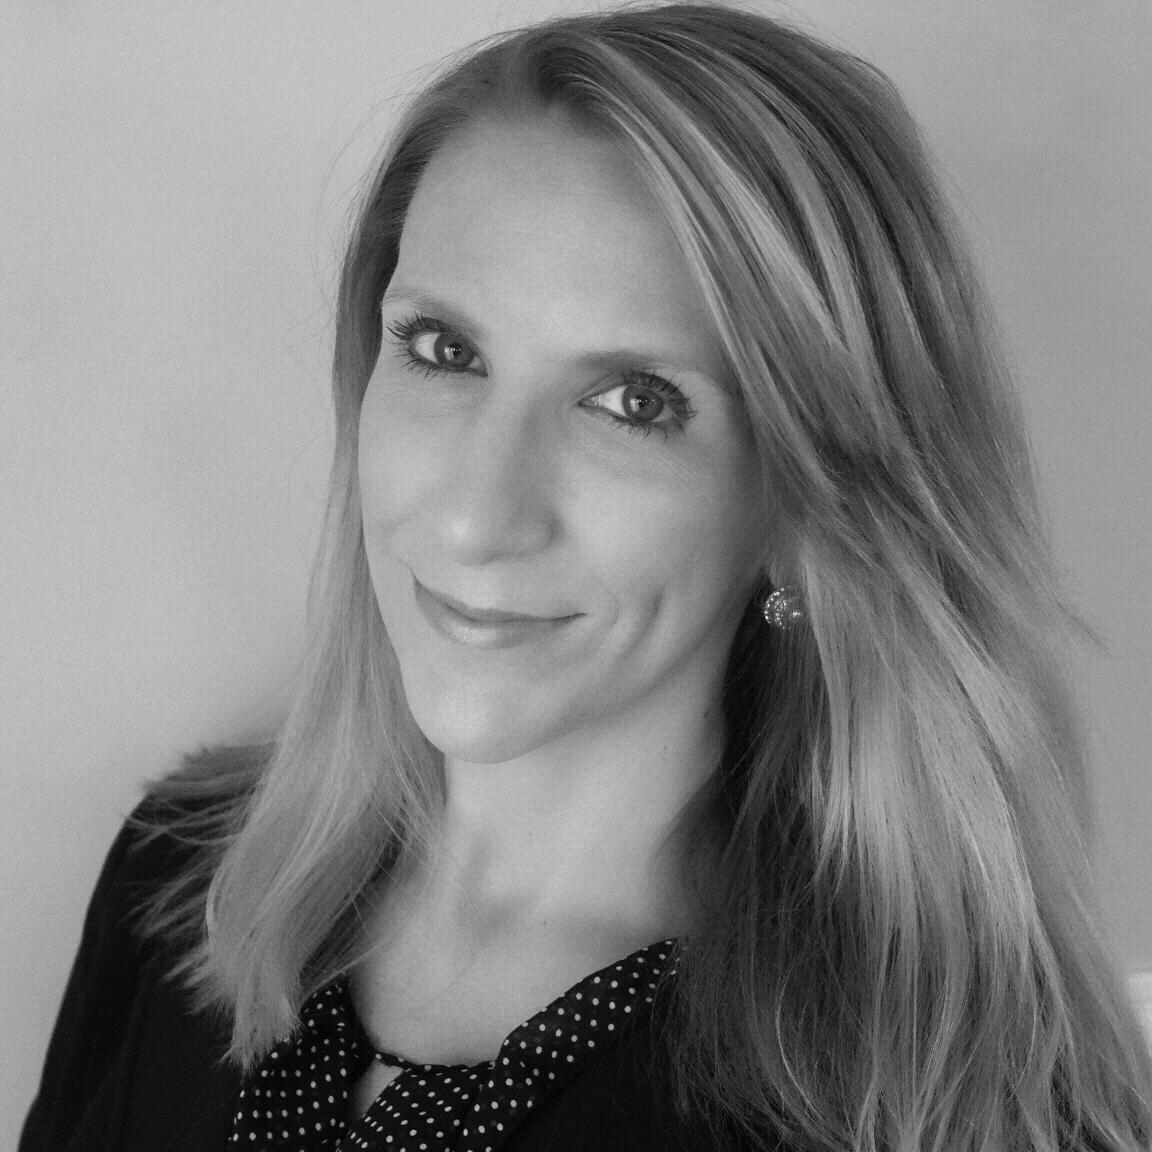 Stacey DiStefano, MHA - Chief Operating Officer617-641-9743 x702sdistefano@mavenproject.org